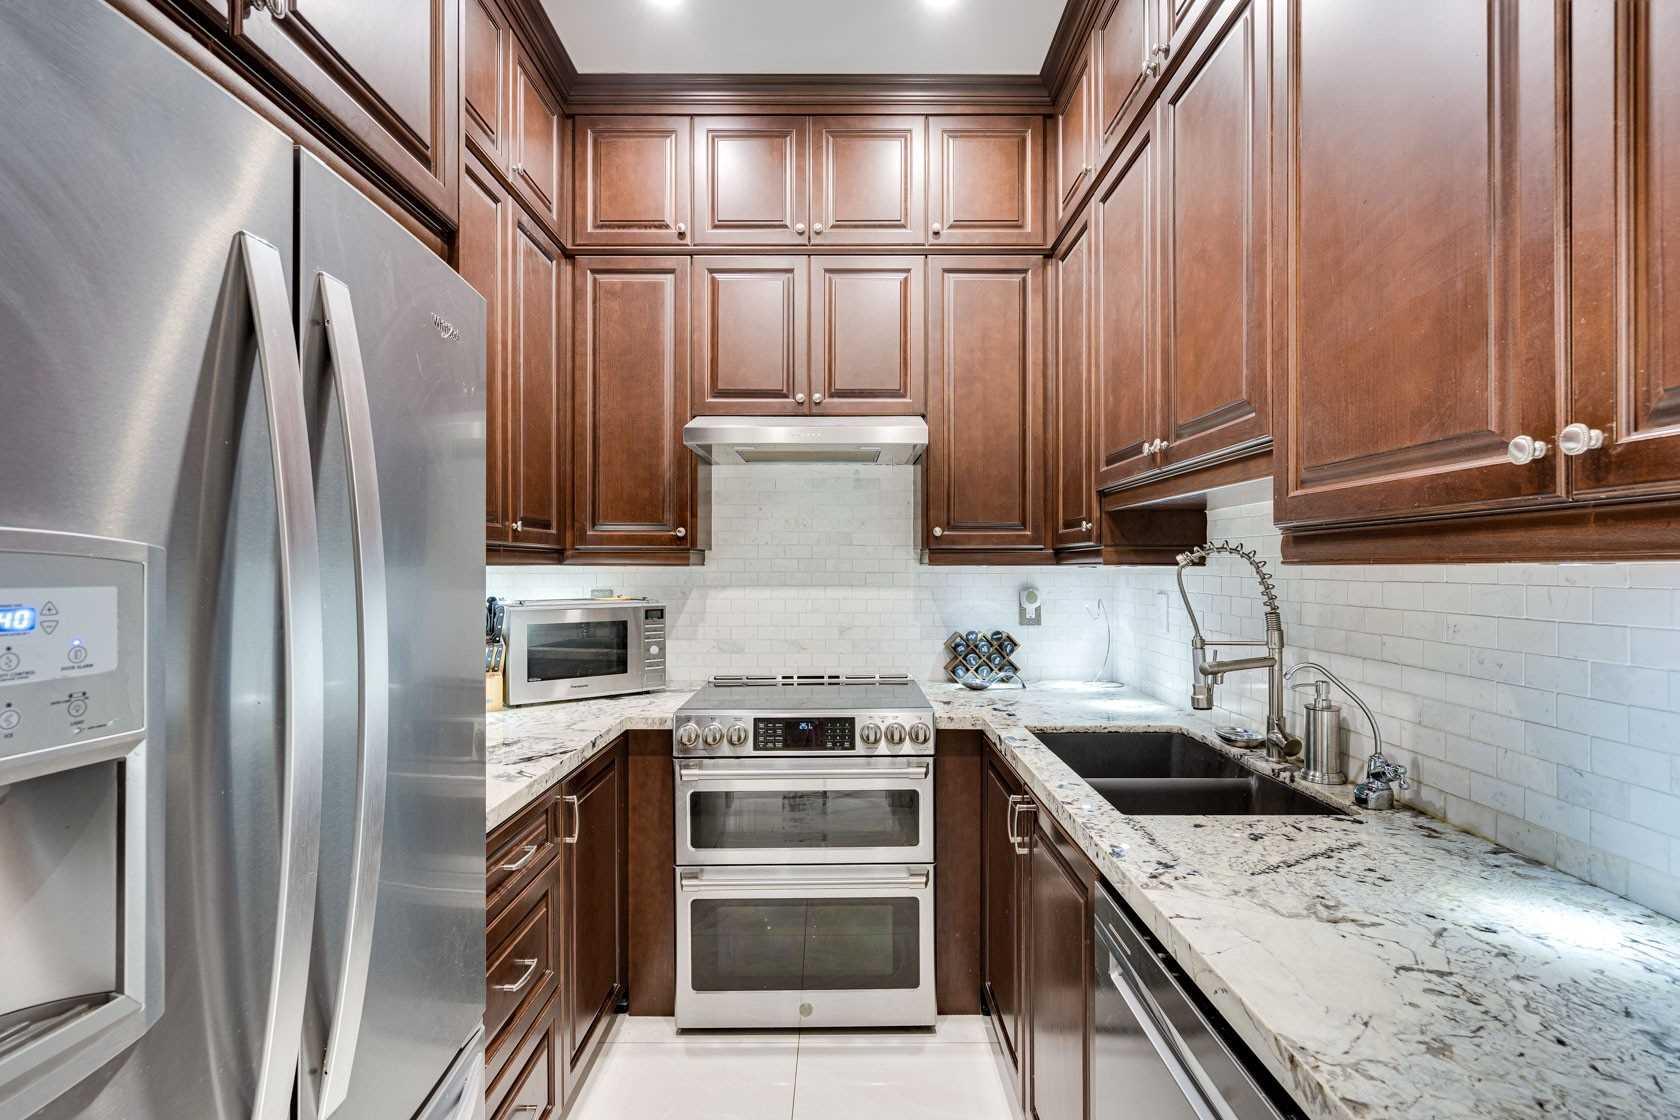 Detached house For Sale In Burlington - 2637 Bluffs Way, Burlington, Ontario, Canada L7M0T8 , 5 Bedrooms Bedrooms, ,3 BathroomsBathrooms,Detached,For Sale,Bluffs